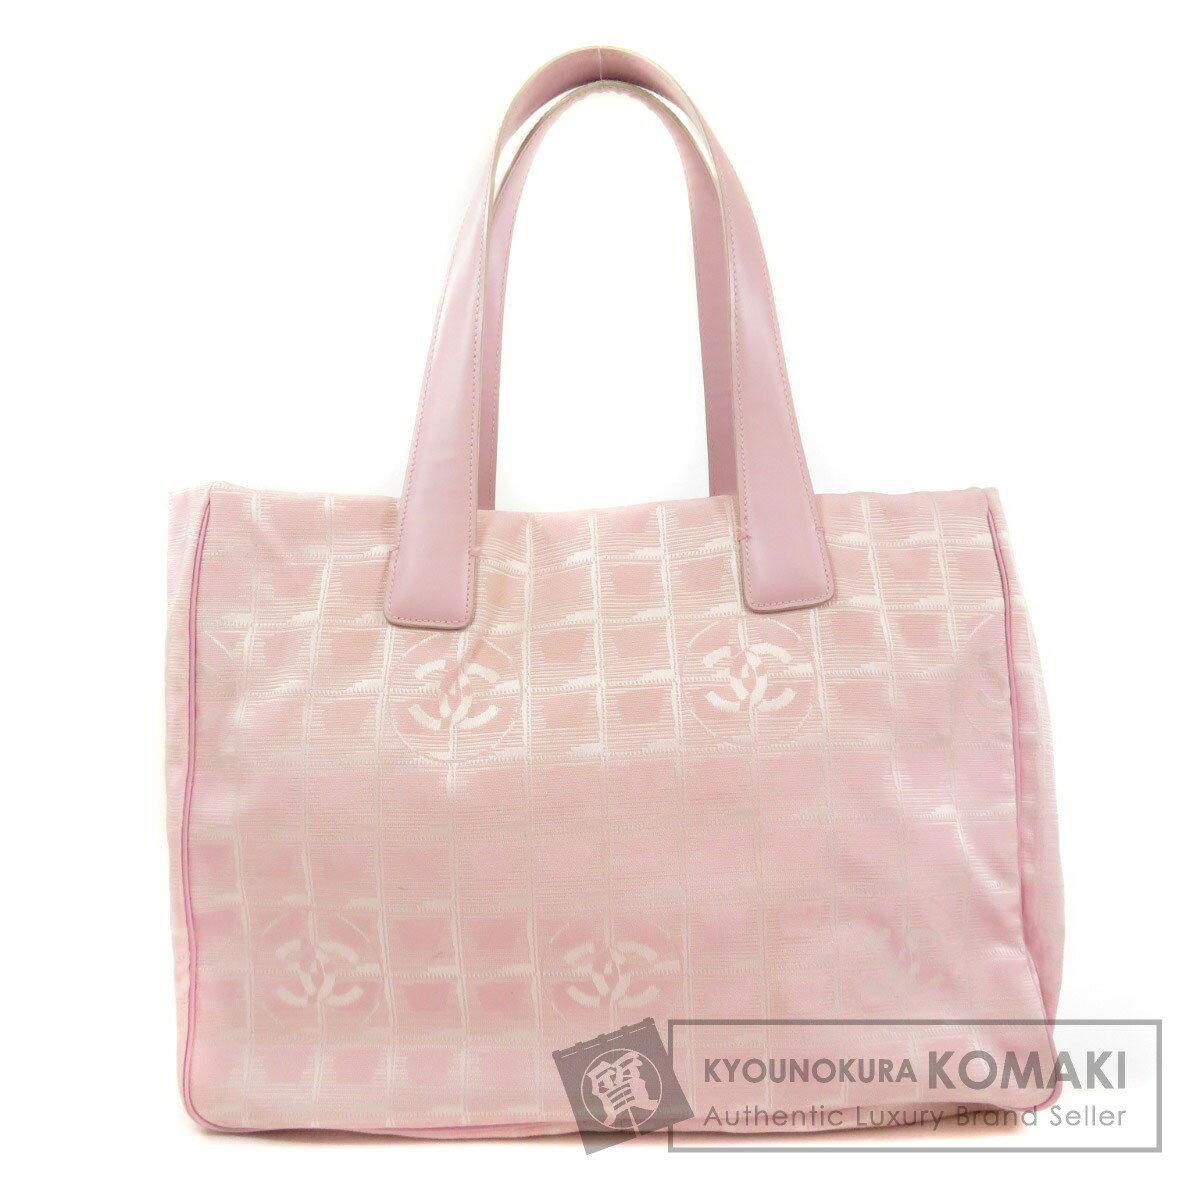 CHANEL nylon bag 2451025()23:59 MM CHANEL